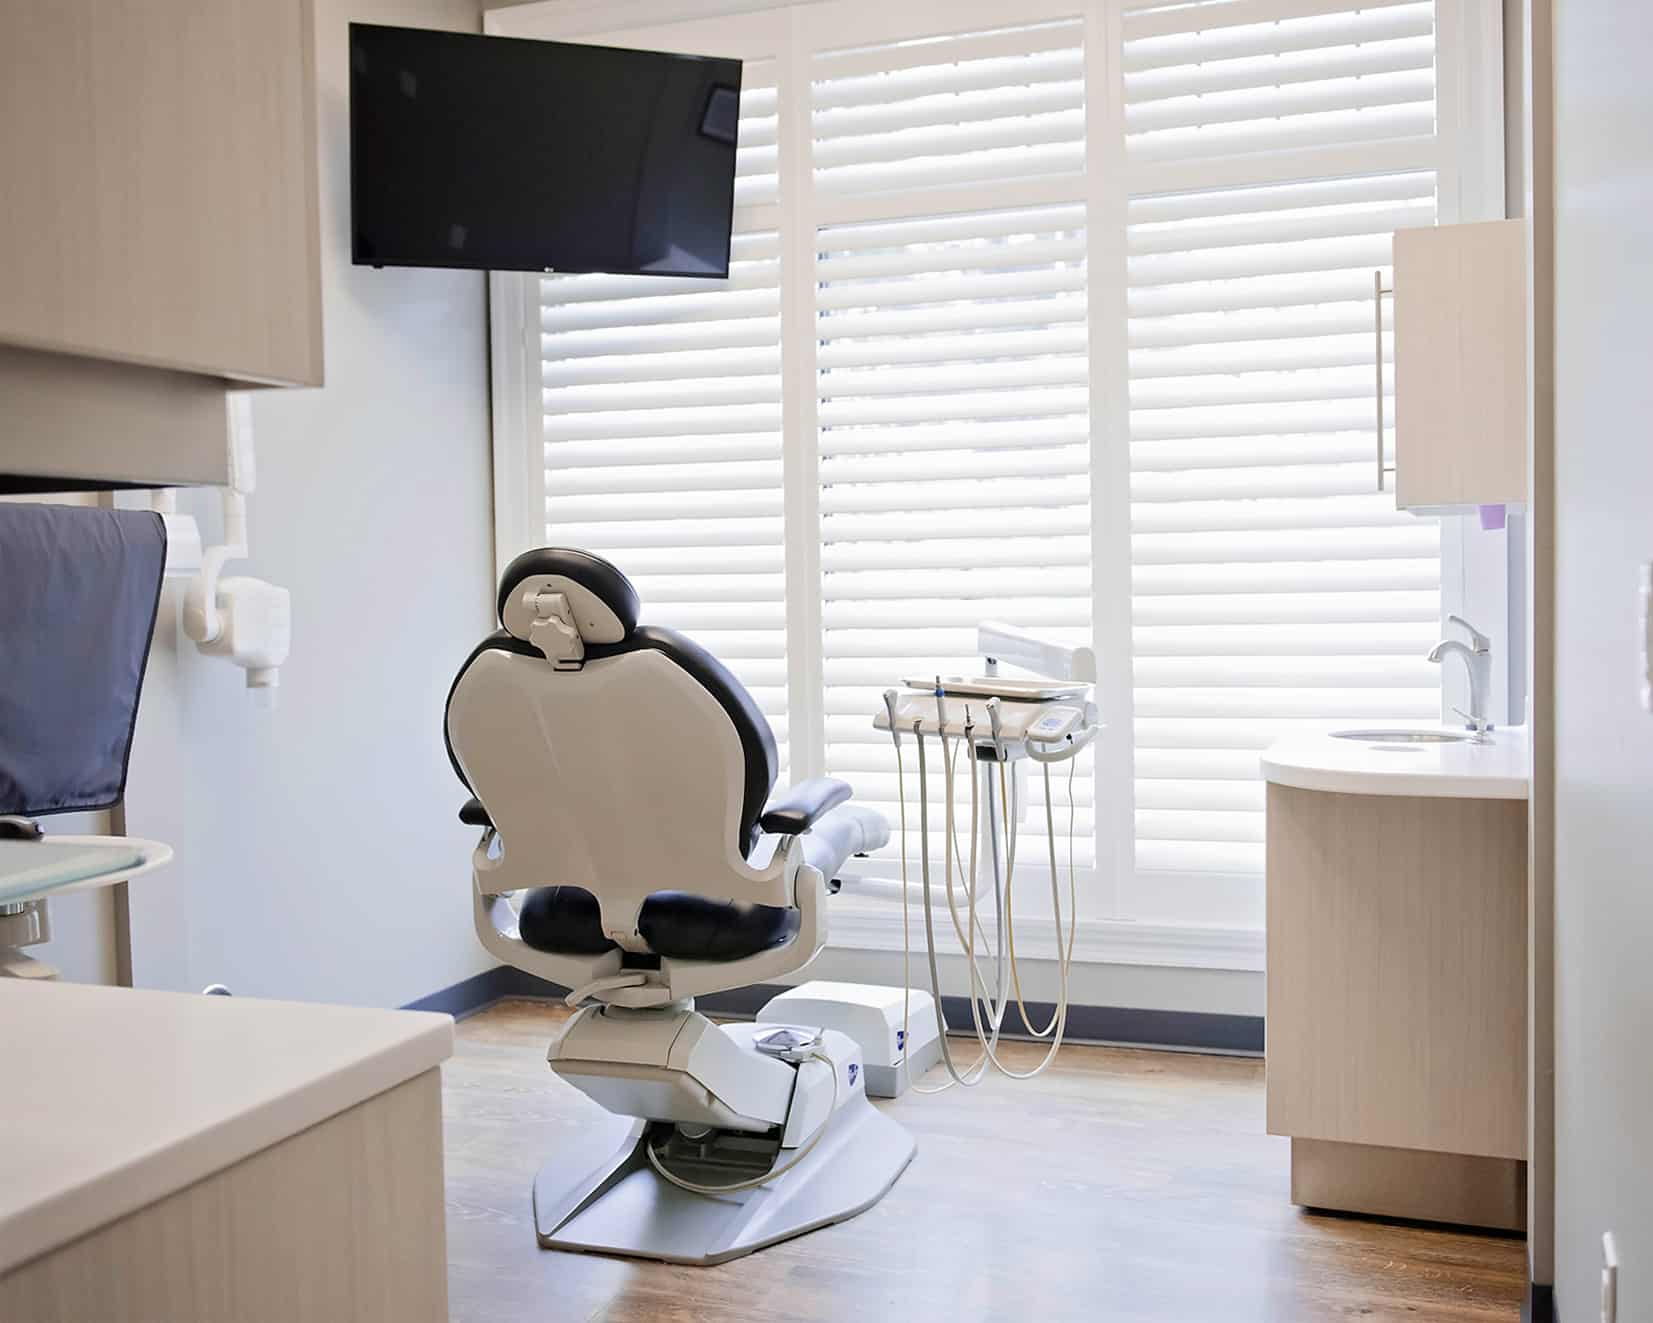 Cranberry Dental Studio | Hygiene Room